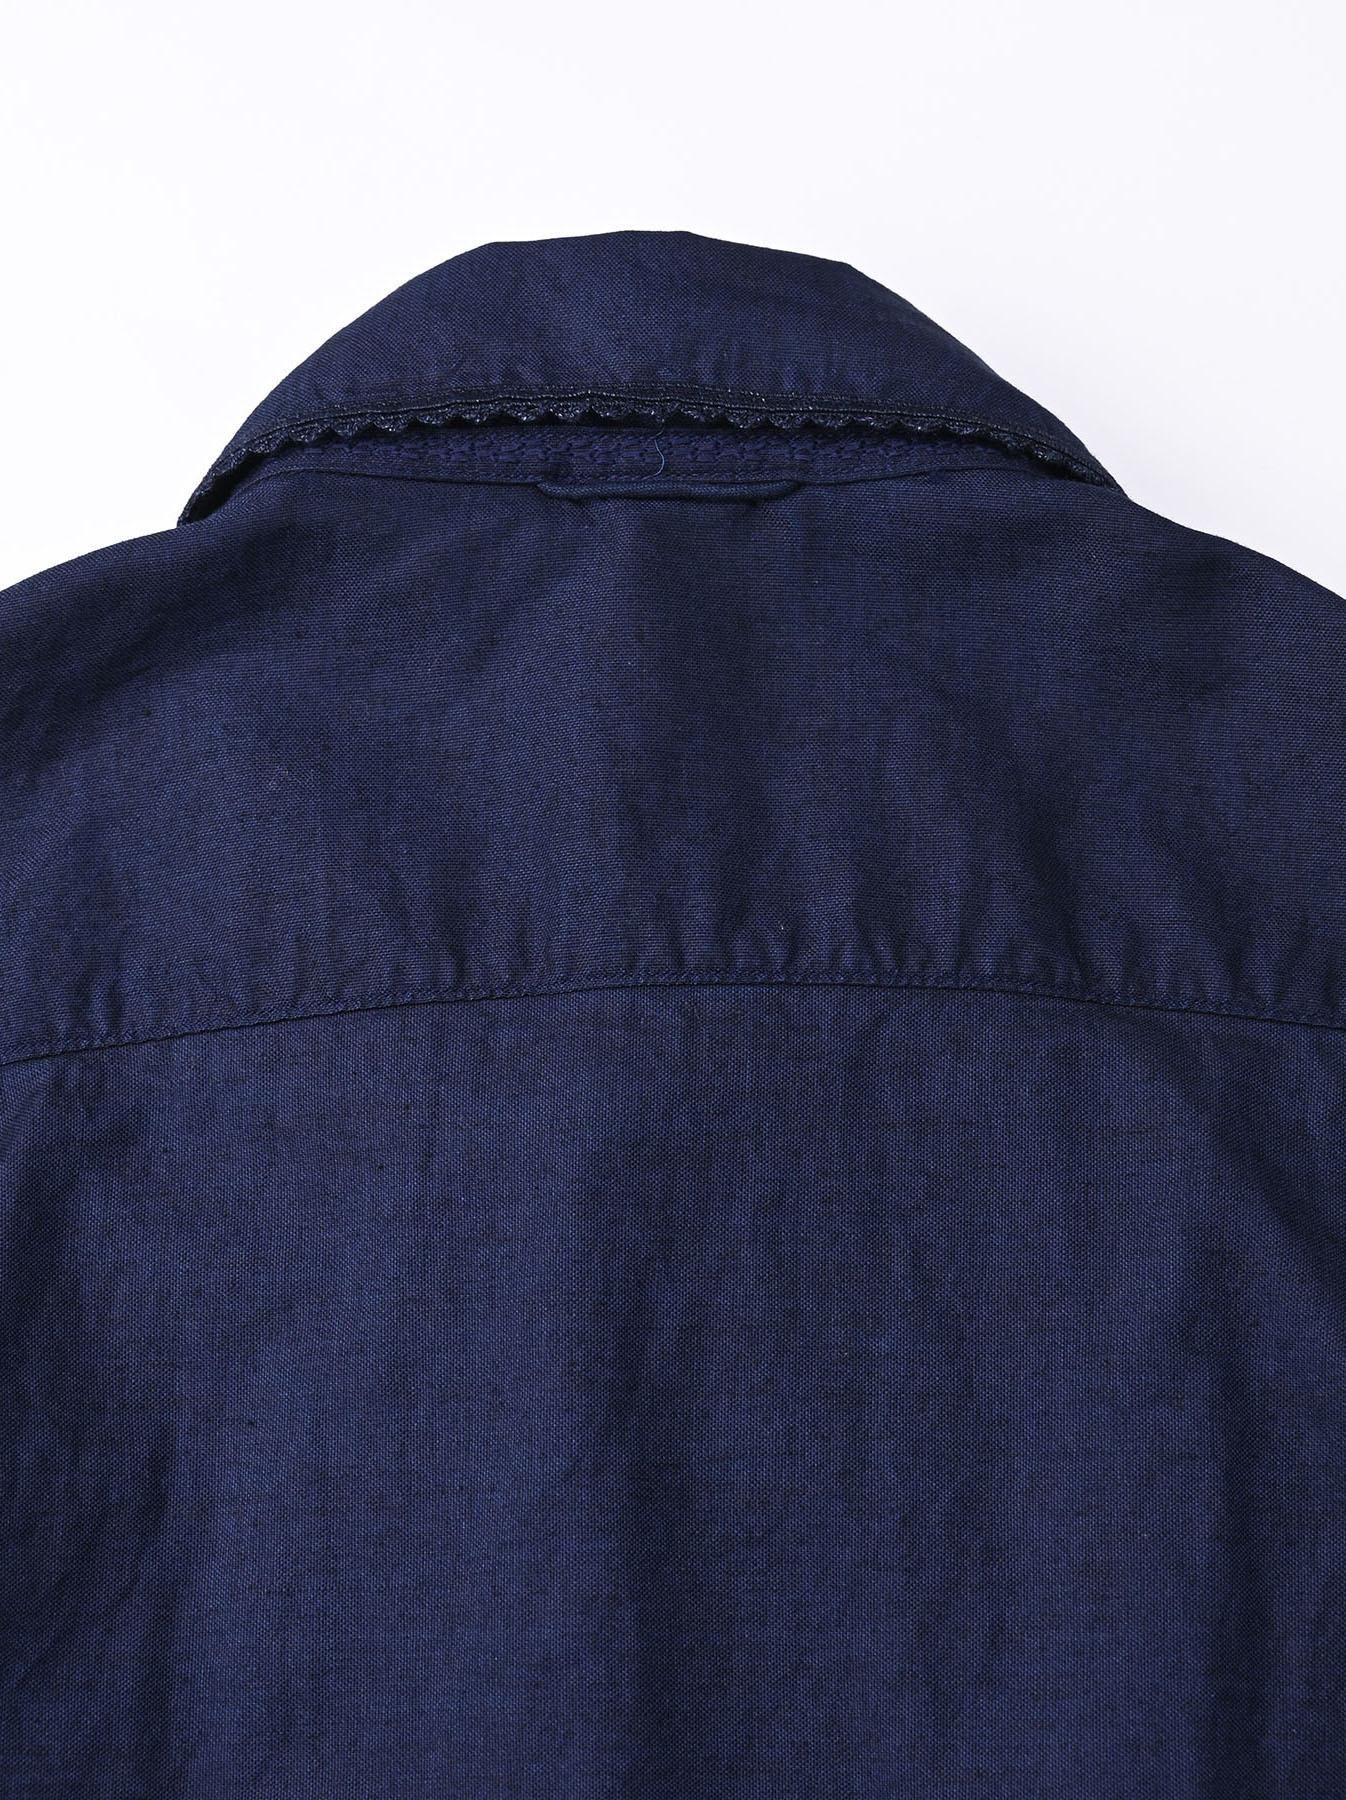 Indigo Thin Oxford 908 Ocean Lace Shirt (0621)-9